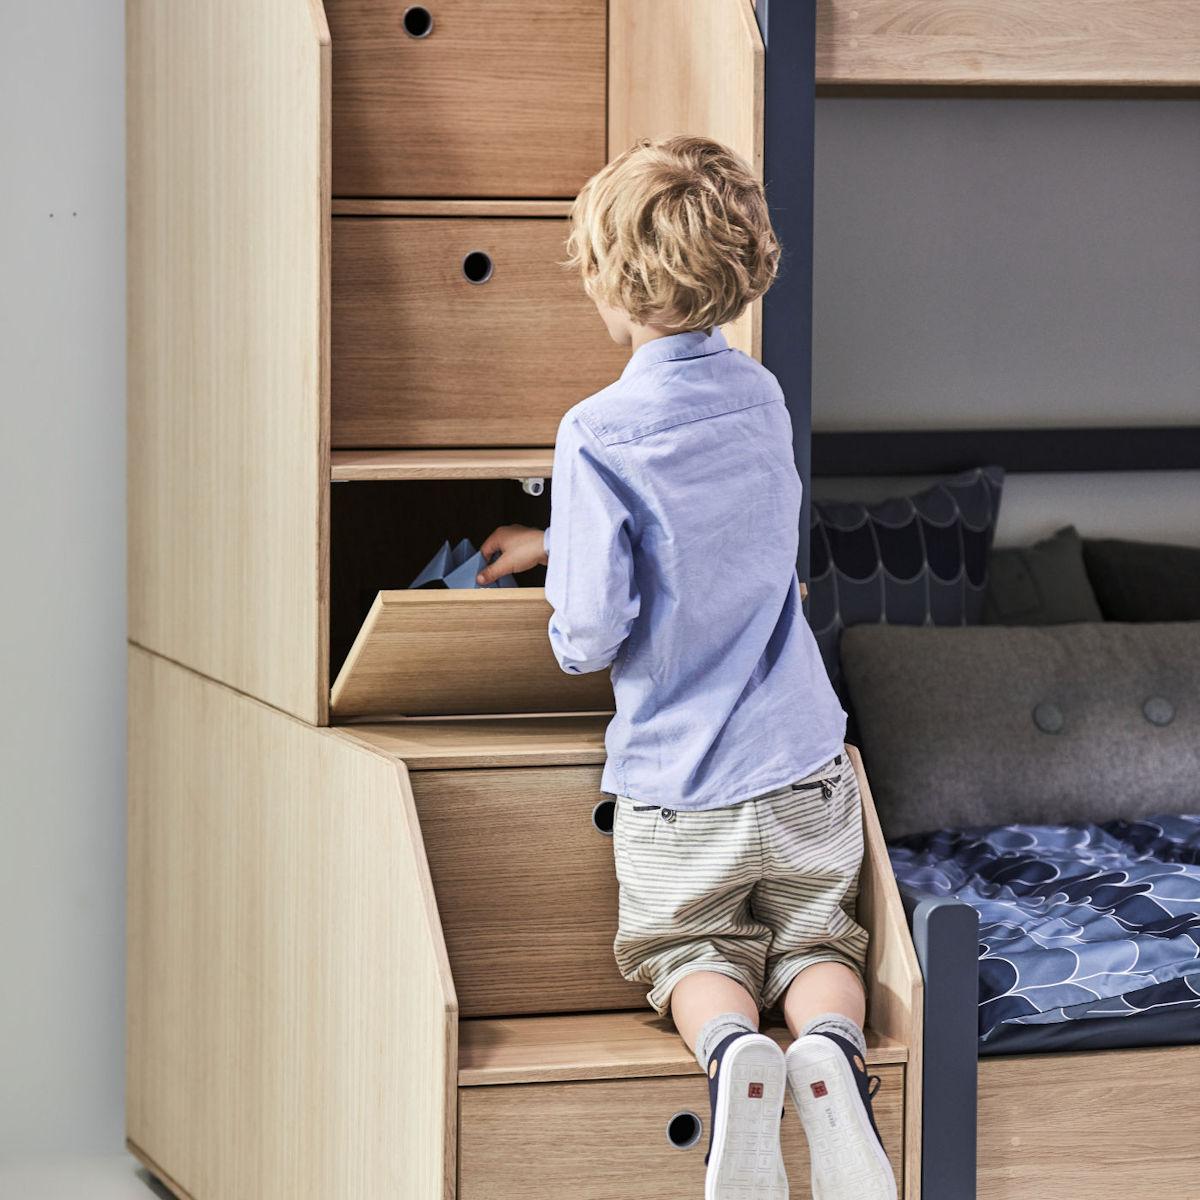 flexa popsicle halbhohes bett 90x200 kiwi 90 10765 31. Black Bedroom Furniture Sets. Home Design Ideas